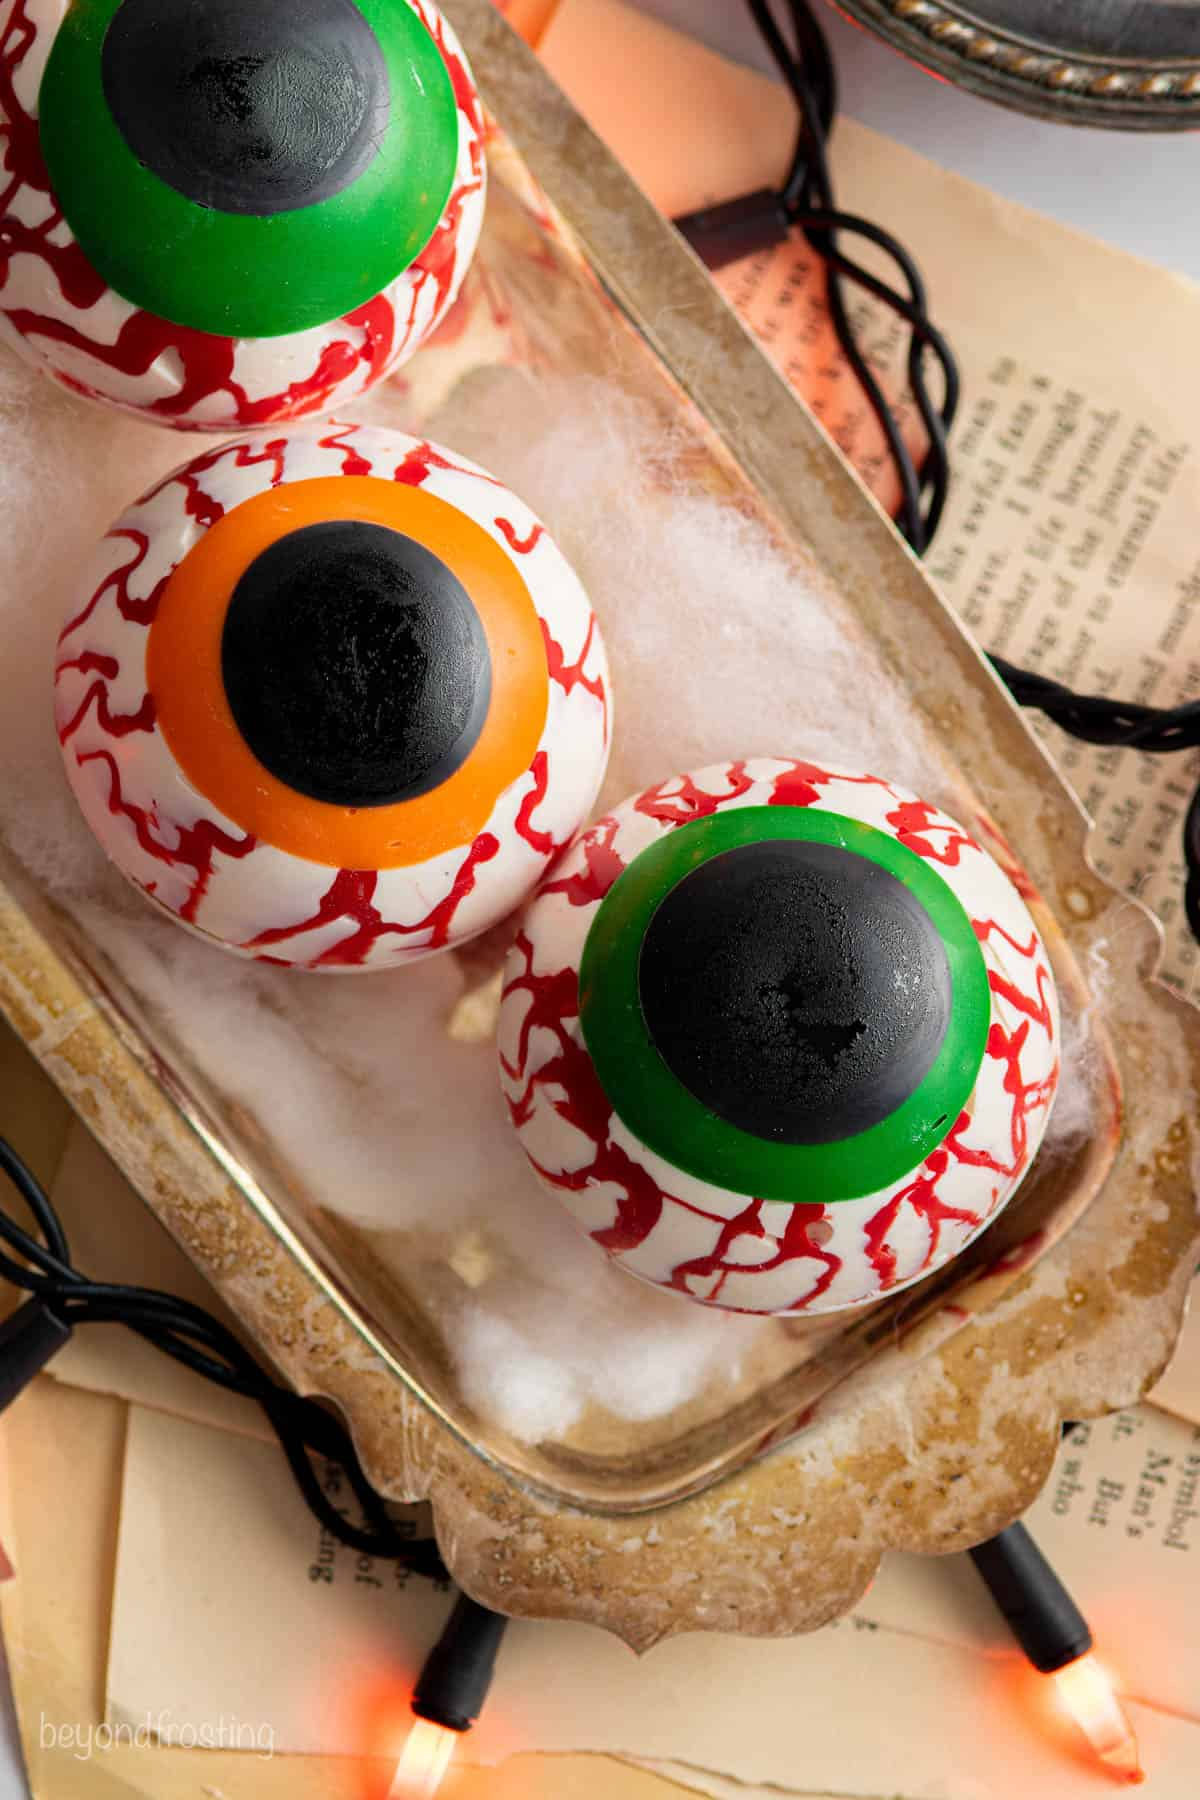 three halloween hot chocolate bombs decorated to look like eyeballs on a vintage metal tray